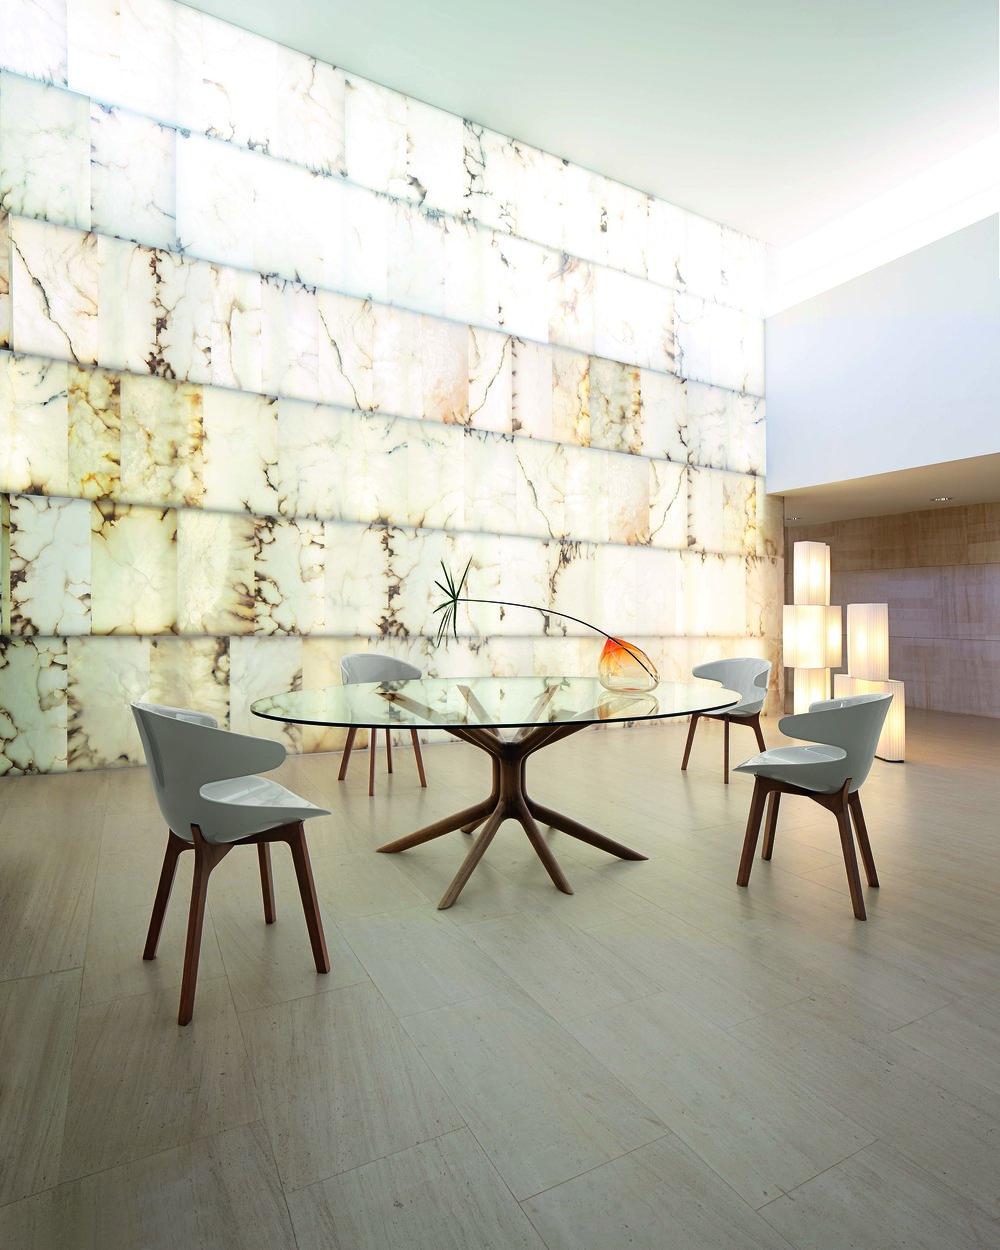 桌腿造型別緻的鋼化玻璃桌面圓桌  Roche Bobois Mangrove Dining Table, Starting at $8,990 At Roche Bobois, (604) 633-5005, roche-bobois.com